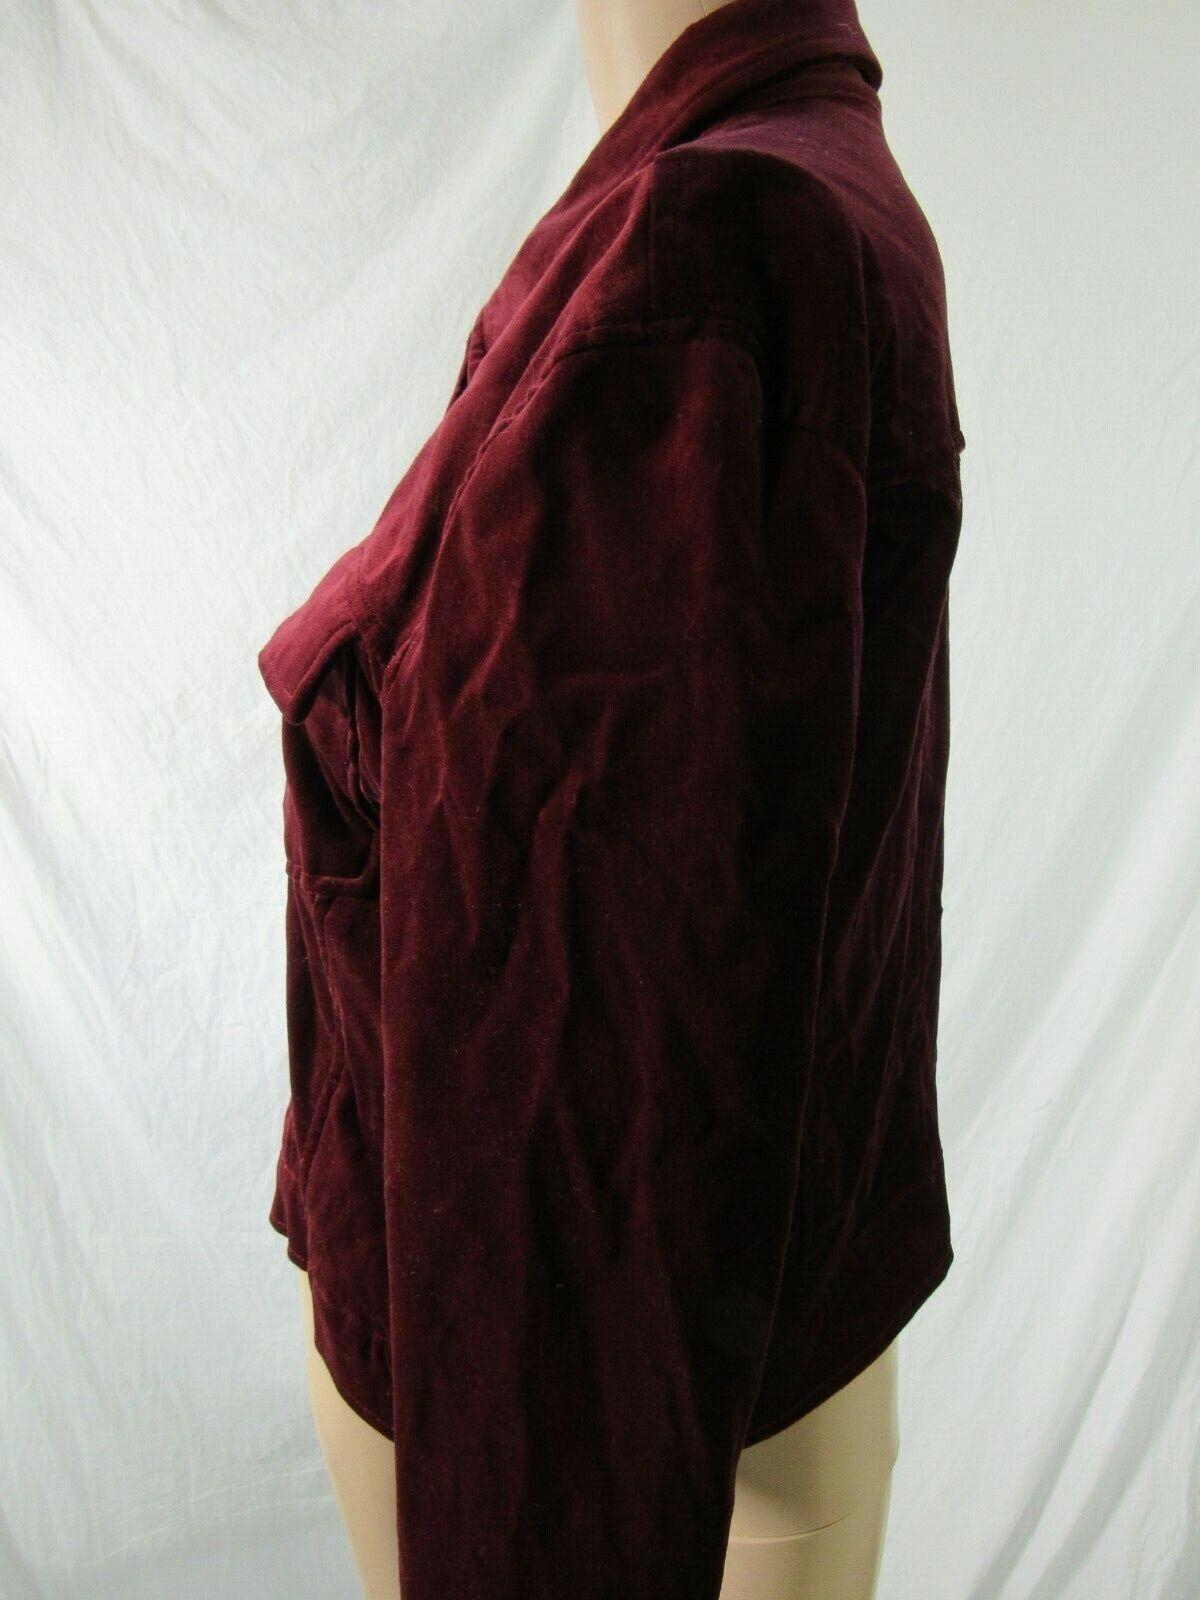 BB Dakota Red Velvet Jacket Blazer Size Large - image 3